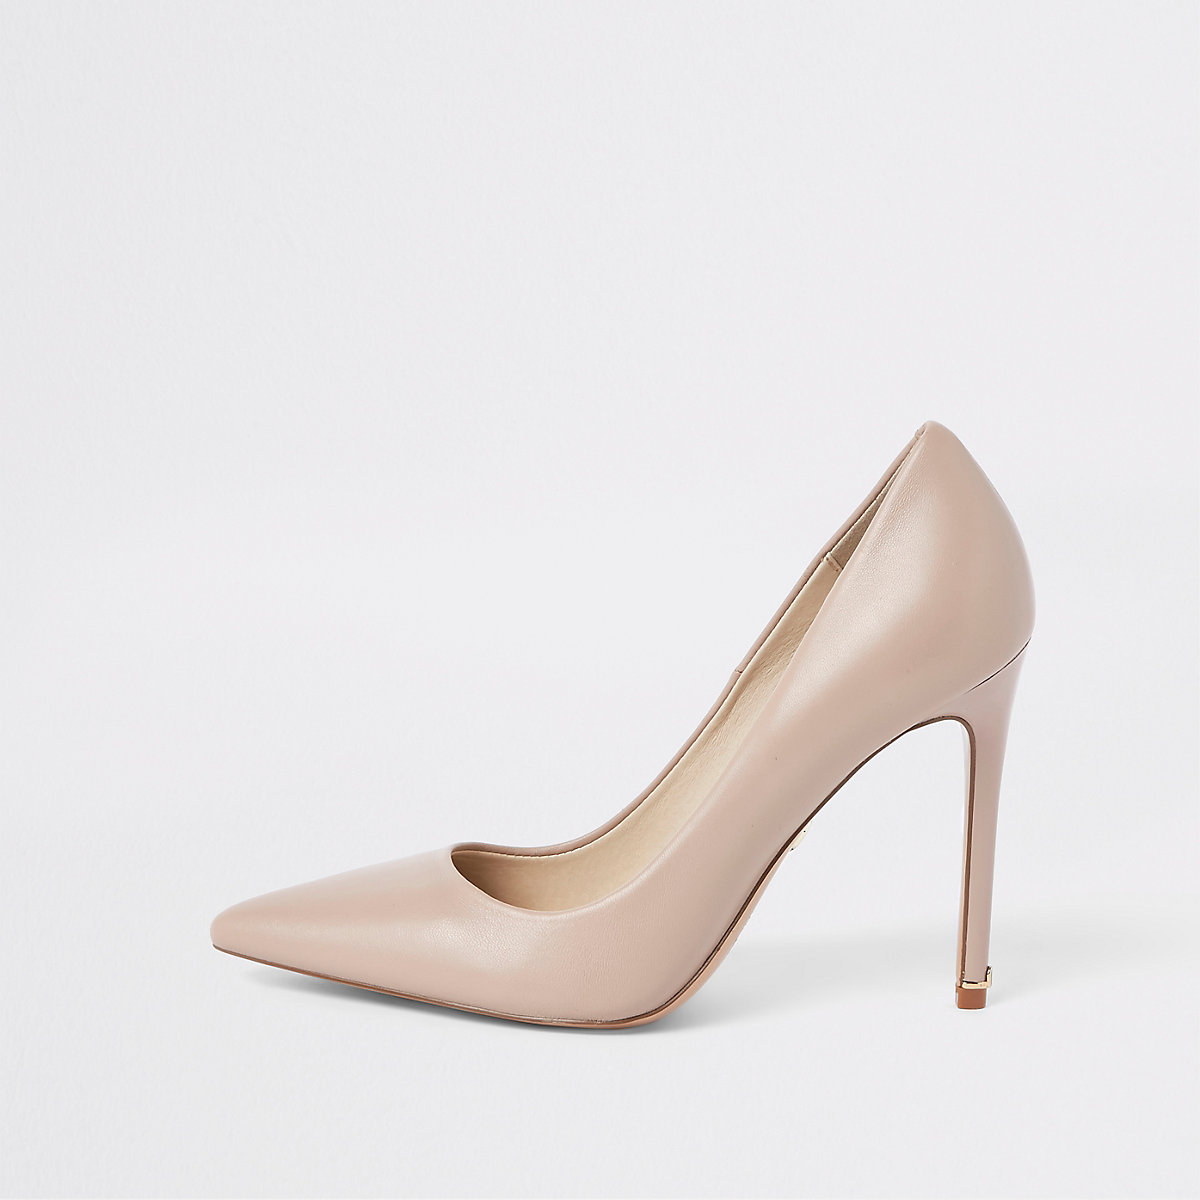 Light pink leather court shoes - Shoes - Shoes   Boots - women 9a0ba302c